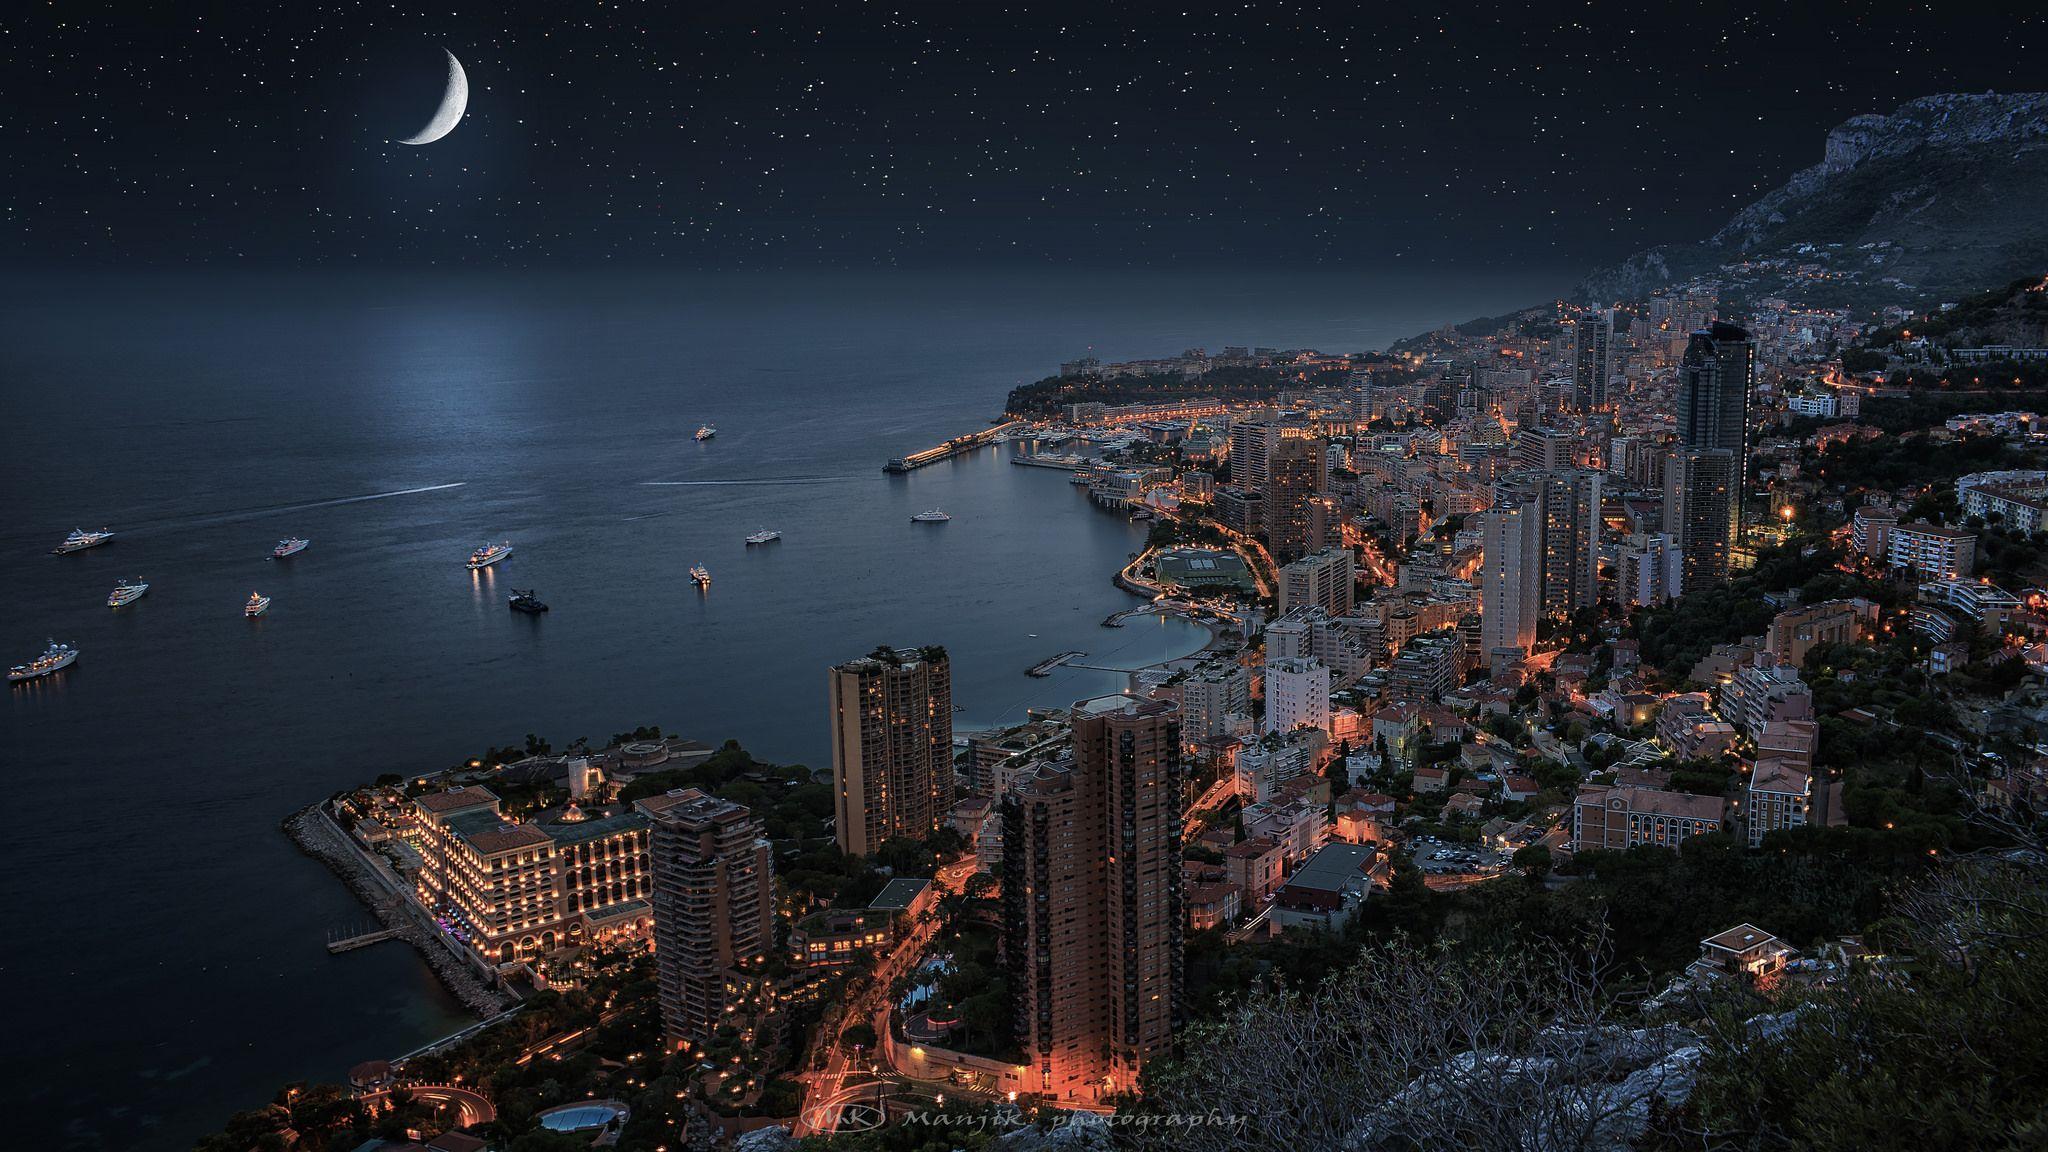 Monaco By Night Starry Sky Monaco Hd Wallpaper Amazing monte carlo wallpapers